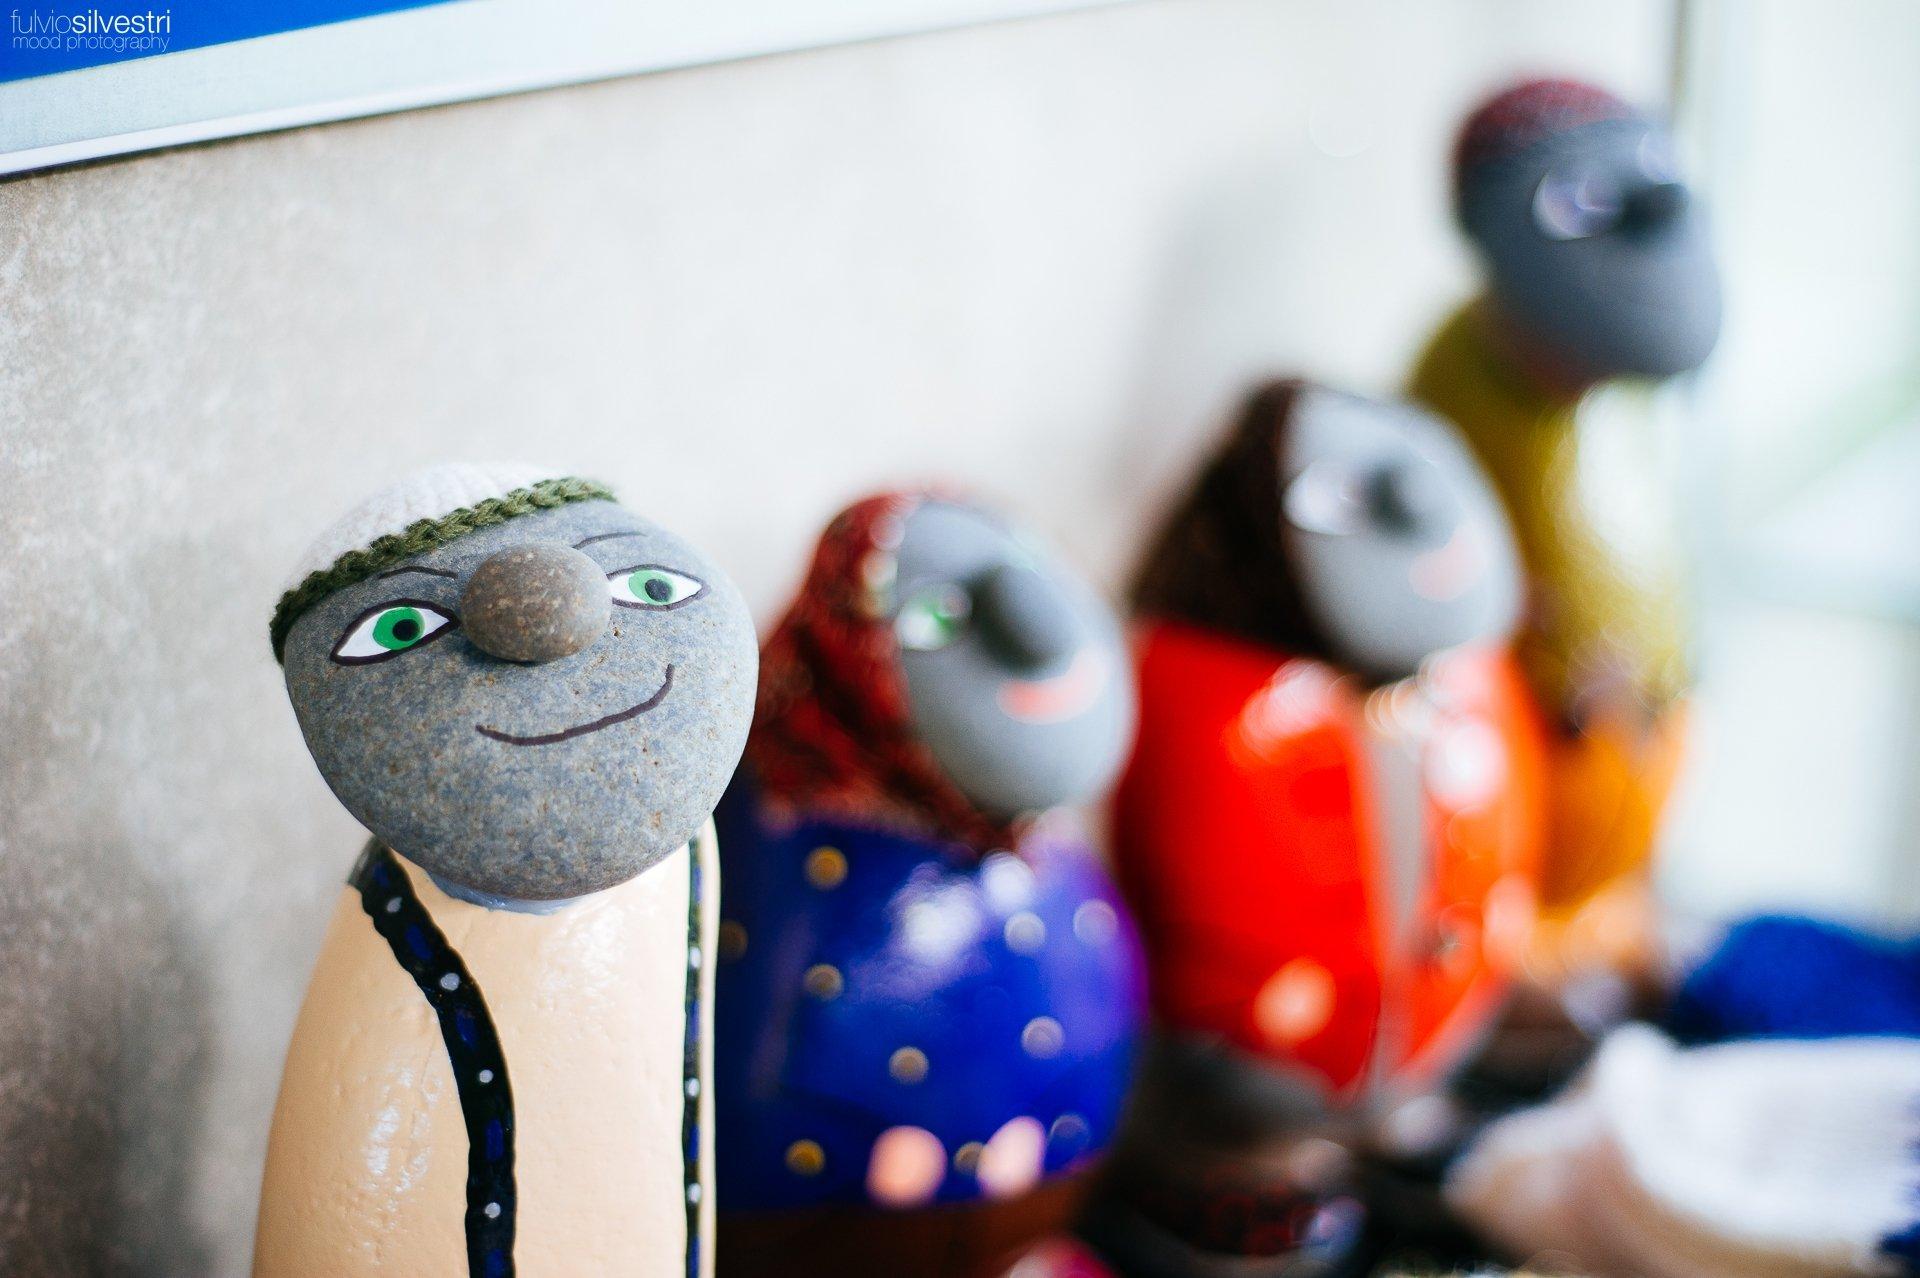 Stone dolls